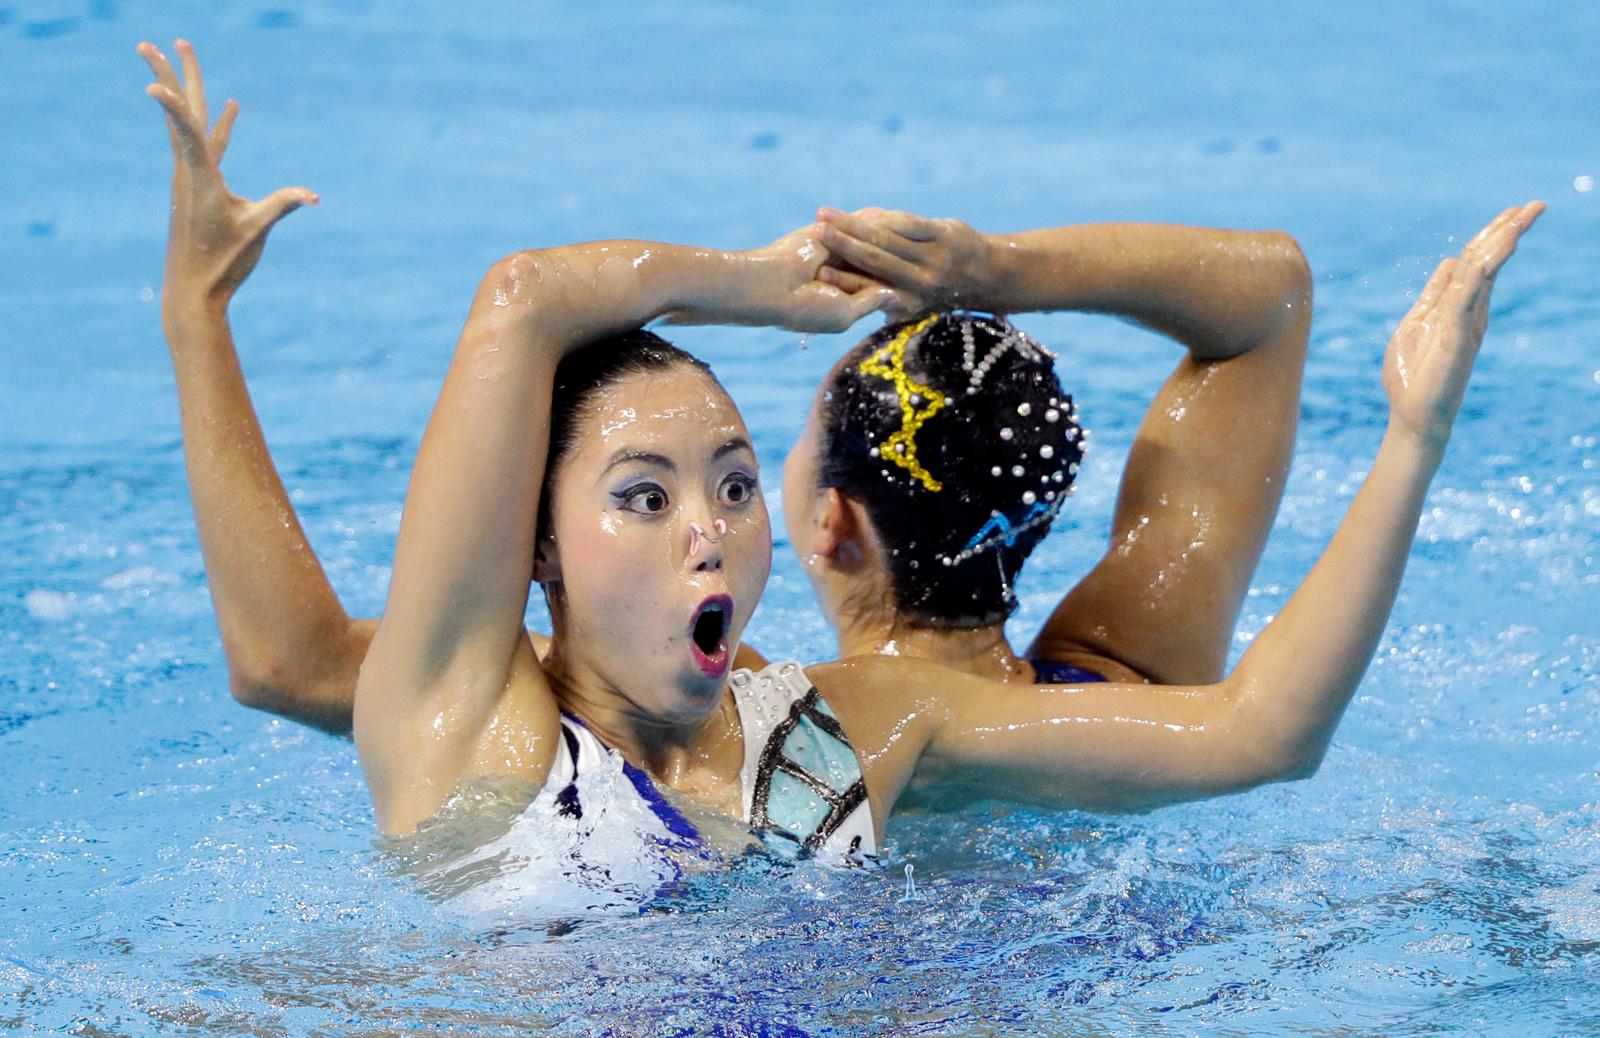 Japan's Yukiko Inui and Megumu Yoshida perform their routine in the artistic swimming duet free preliminary at the World Swimming Championships in Gwangju, South Korea, Tuesday, July 16, 2019. AP